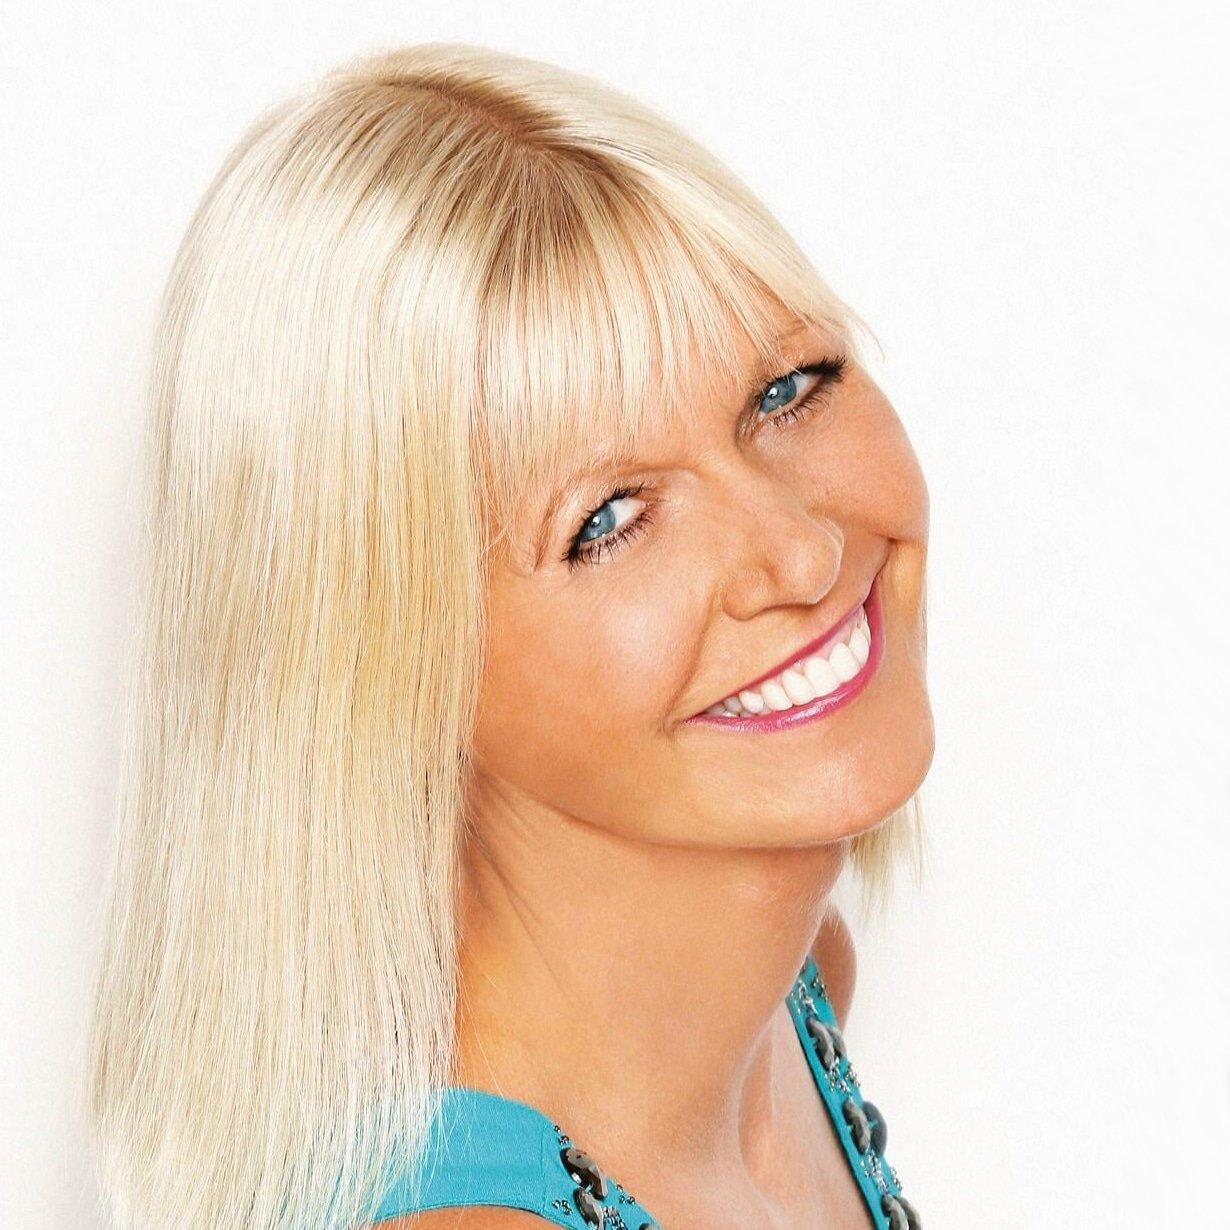 julie_peasgood_lifestyle-travel-relationships-expert-presenter-host-speaker-at-Great-British-Speakers